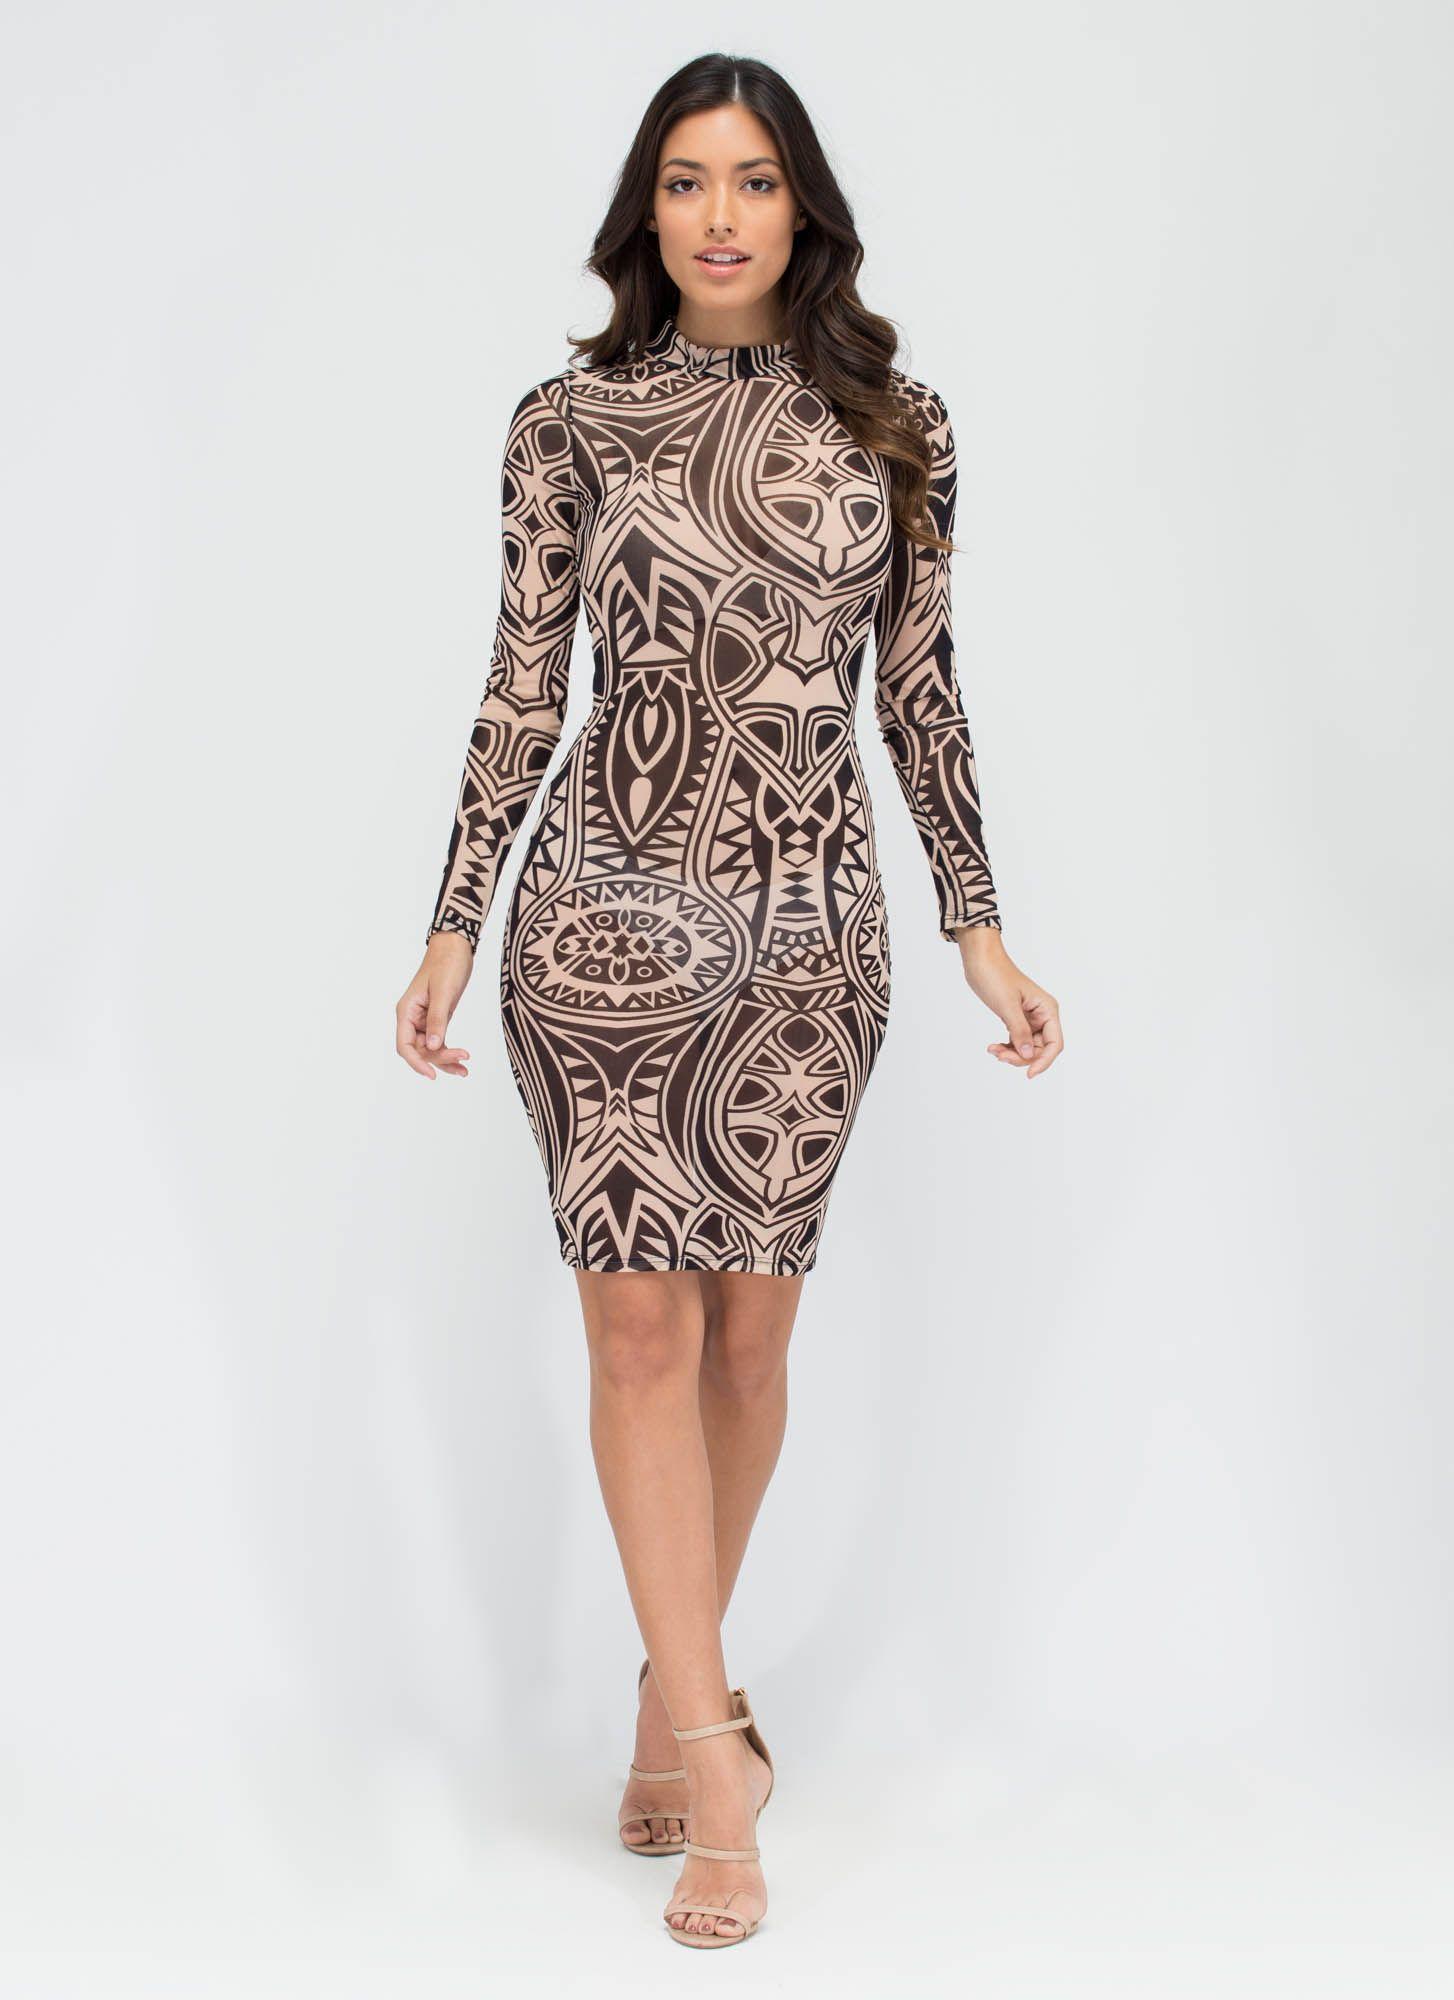 Tattoo Parlor Sheer Patterned Midi Dress BLACKTAUPE - GoJane.com ...